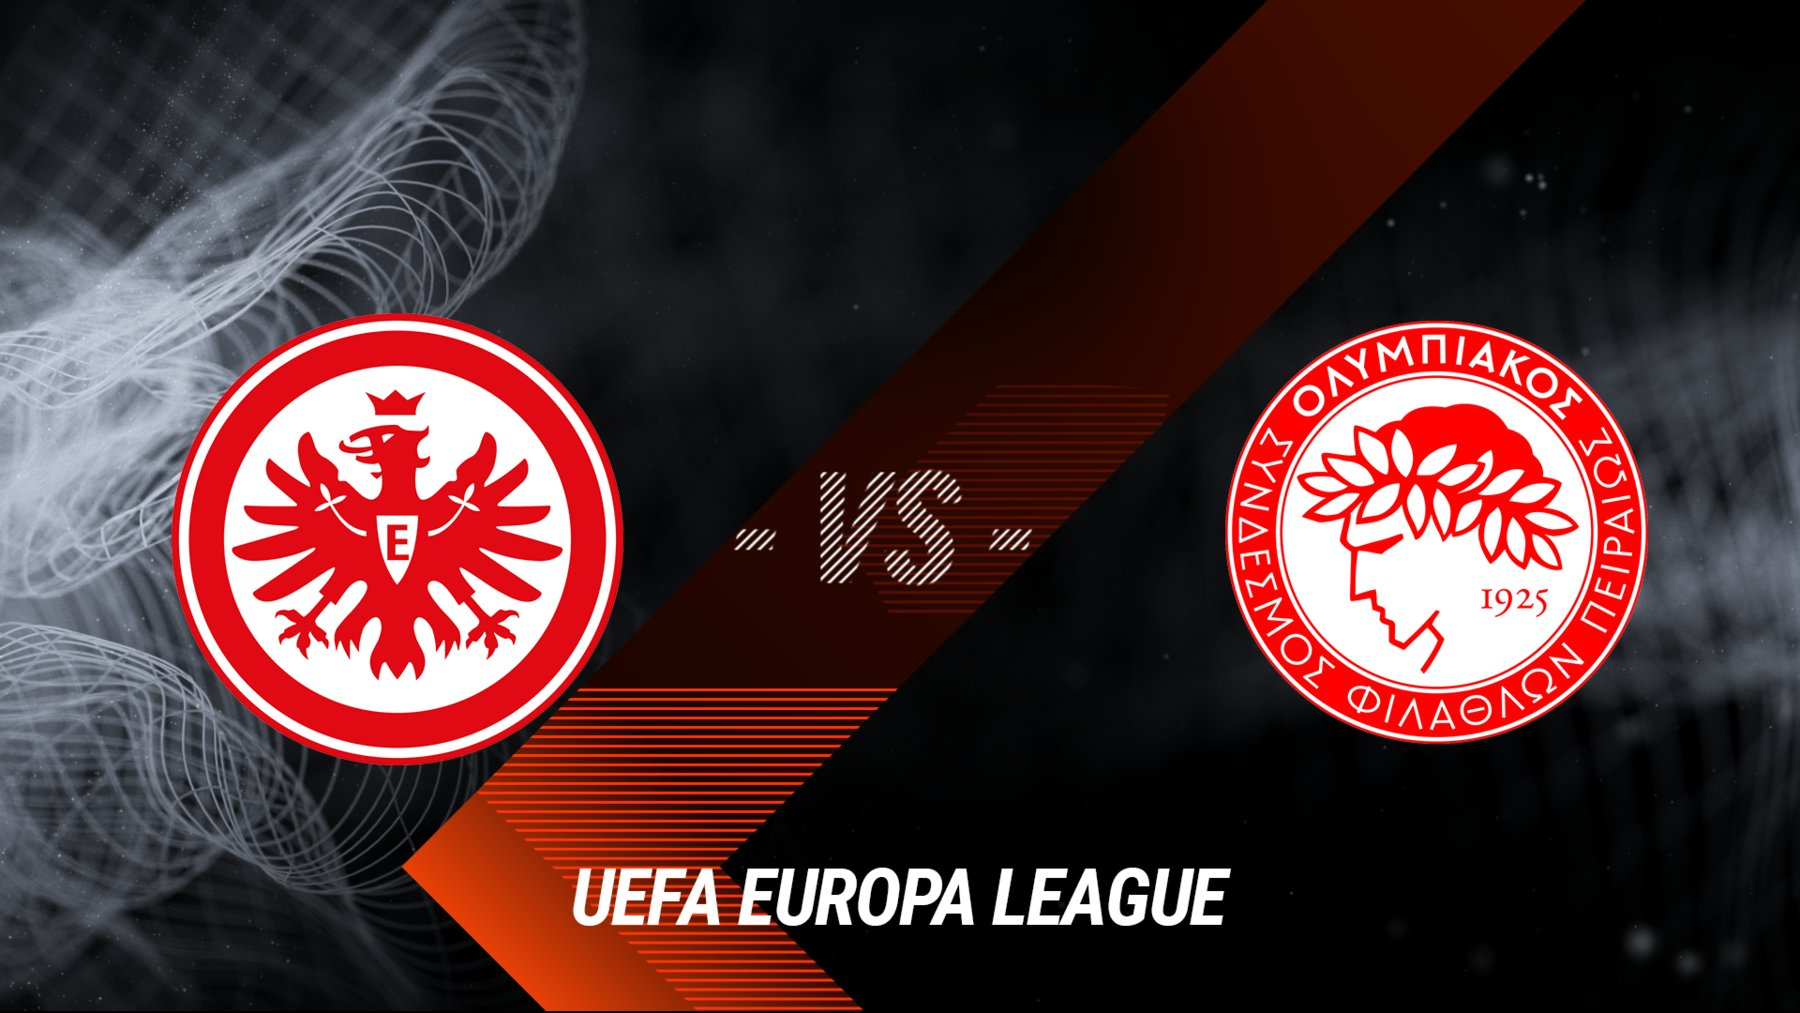 Eintracht Frankfurt vs. Olympiacos Piräus